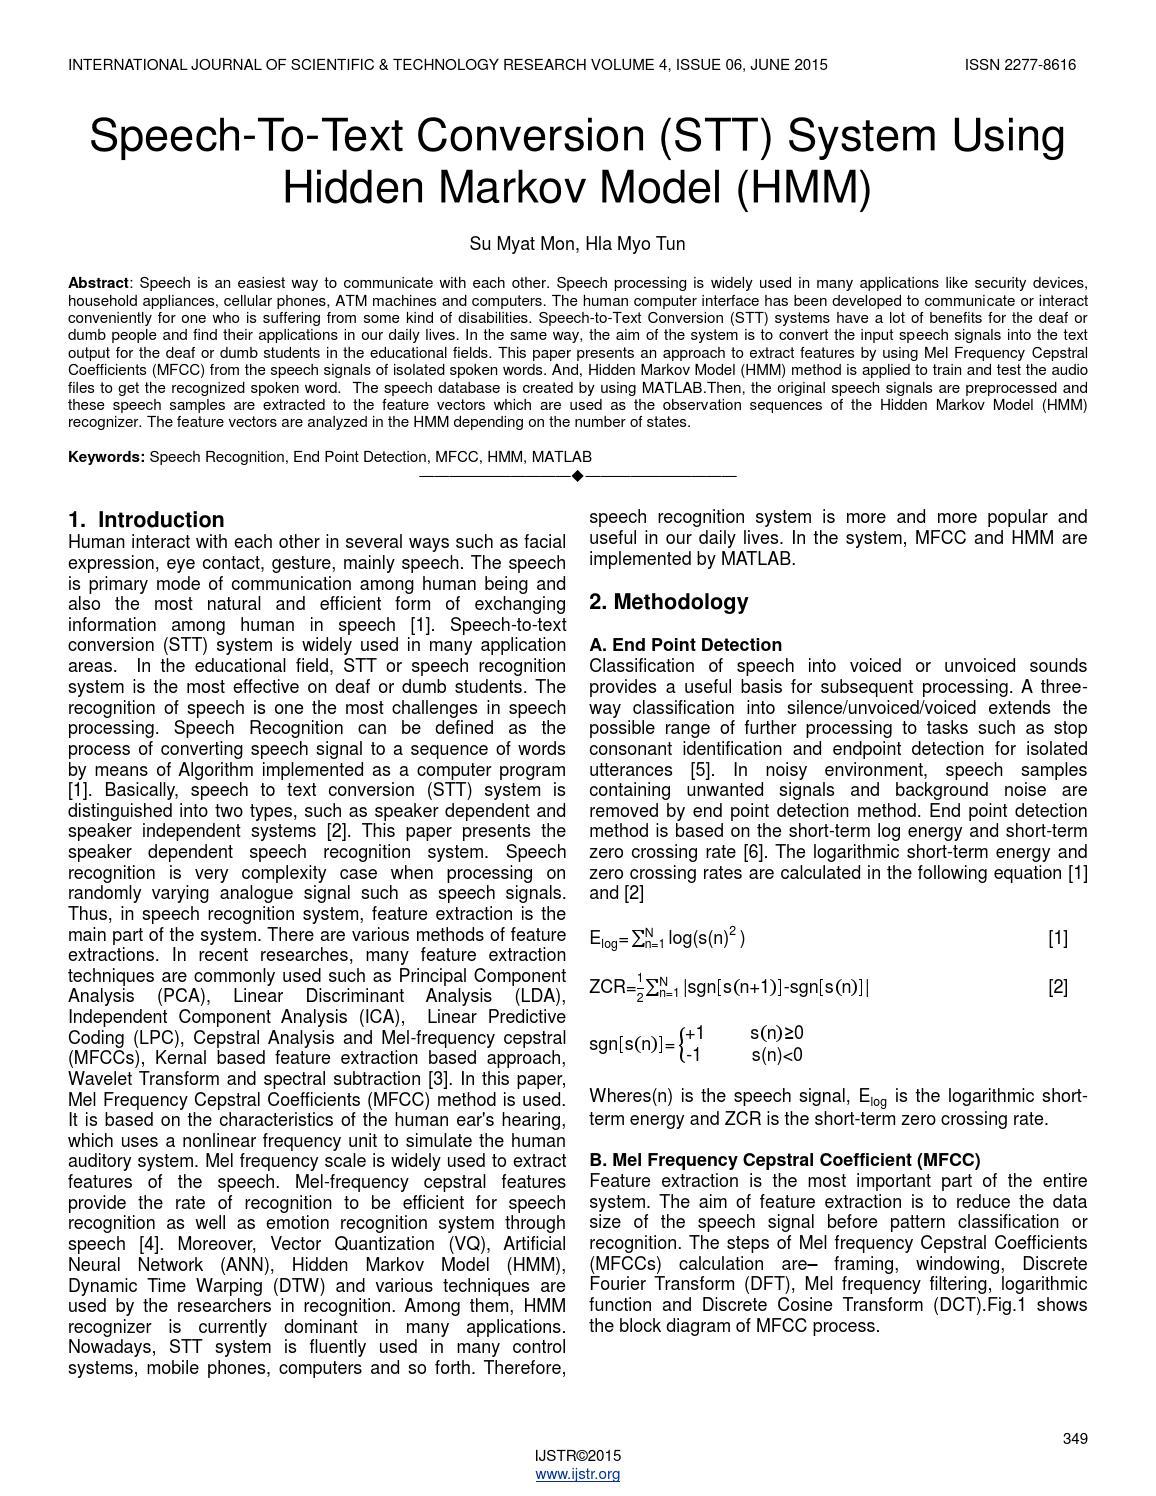 Speech to text conversion stt system using hidden markov model hmm